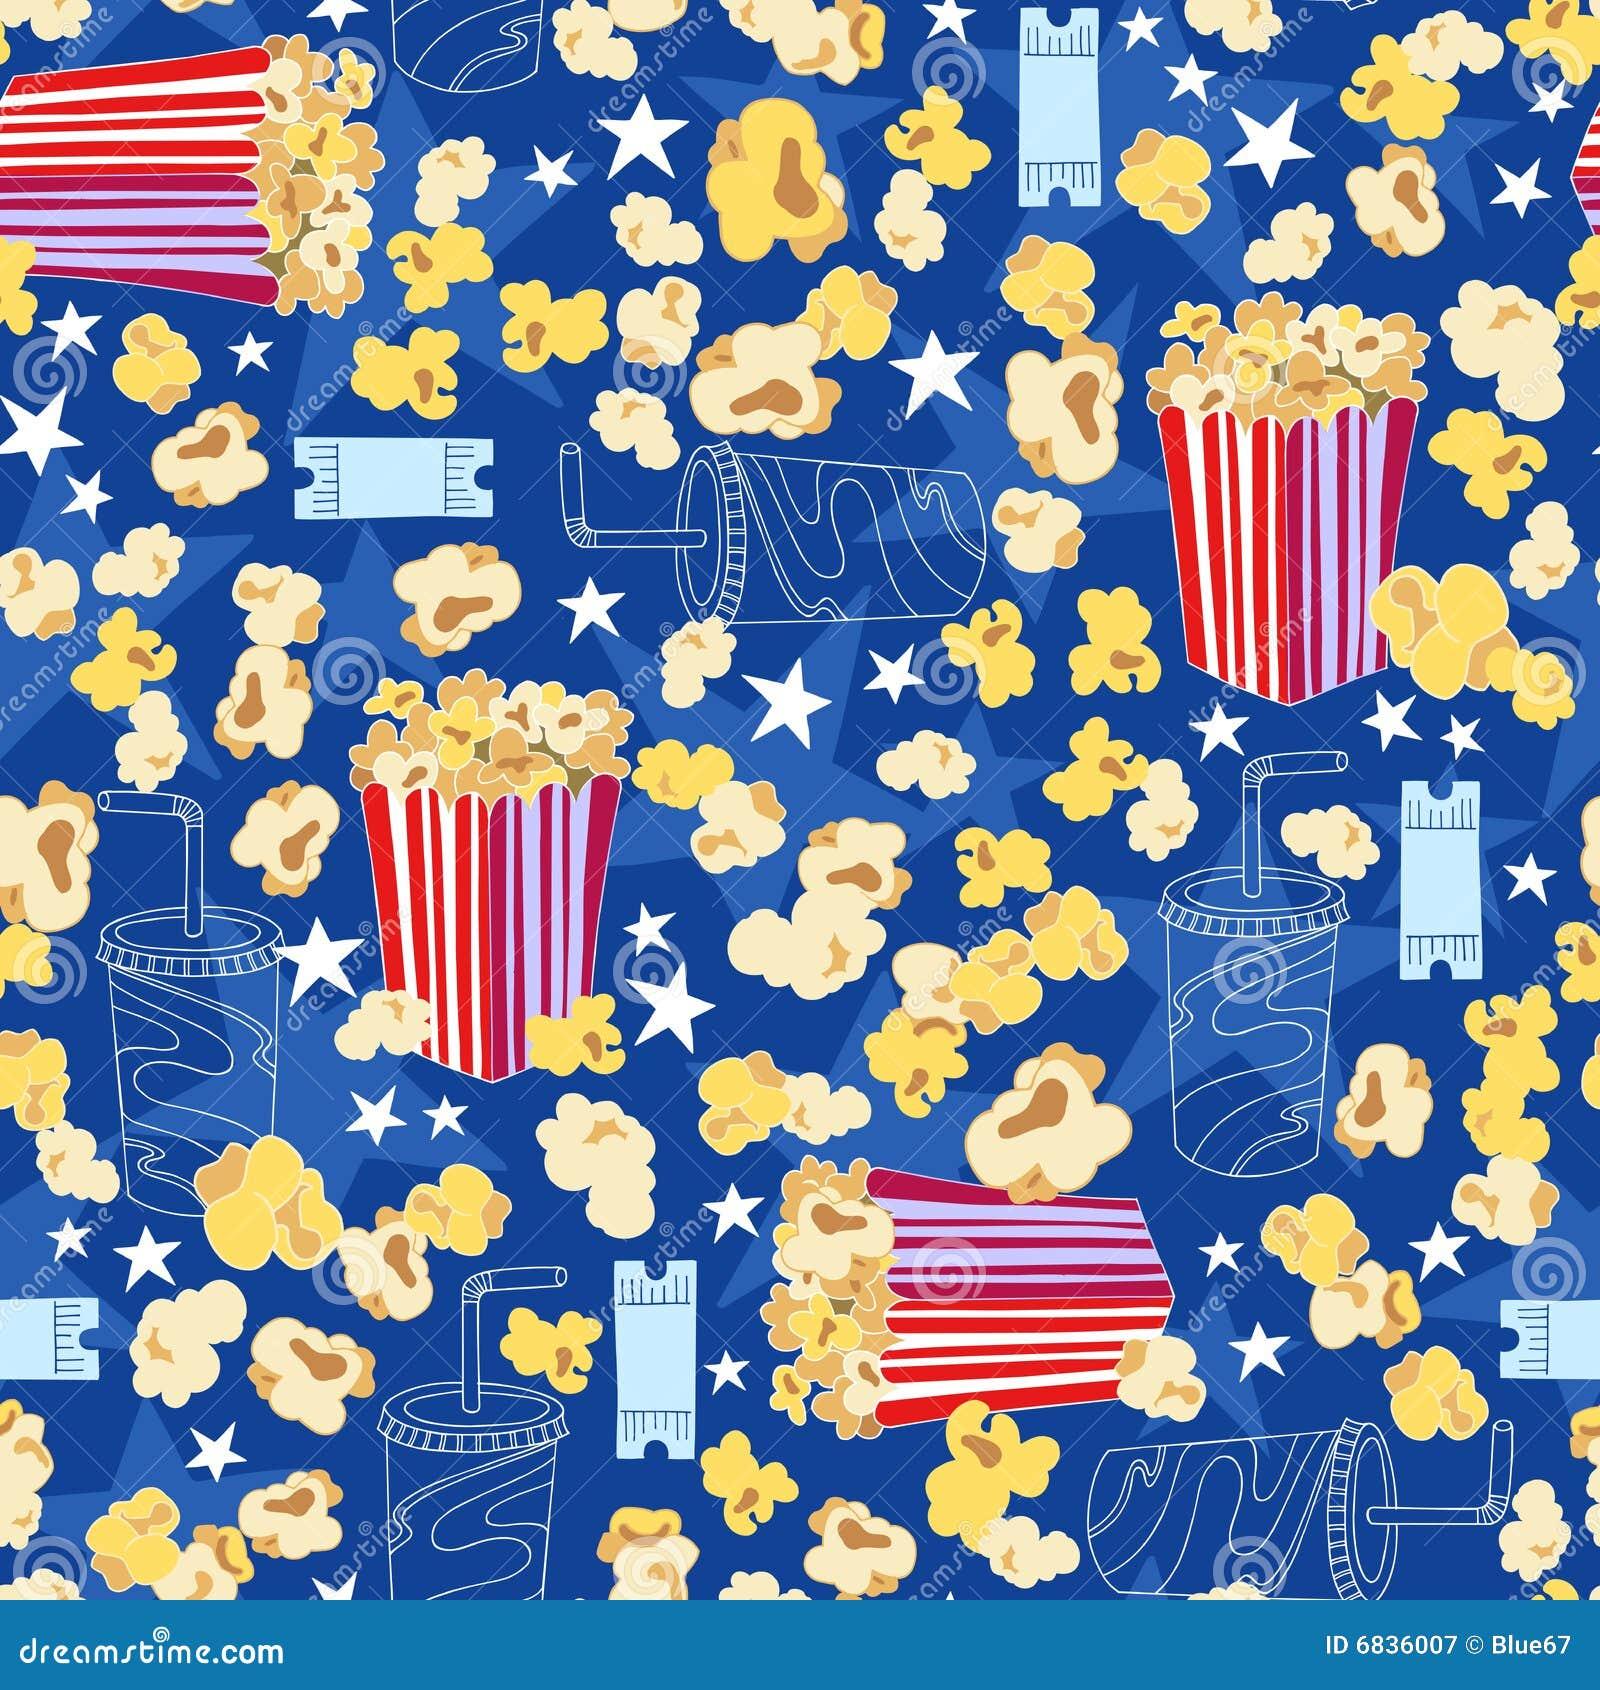 Popcorn Wallpaper: Movie Theater Popcorn Seamless Pattern Royalty Free Stock